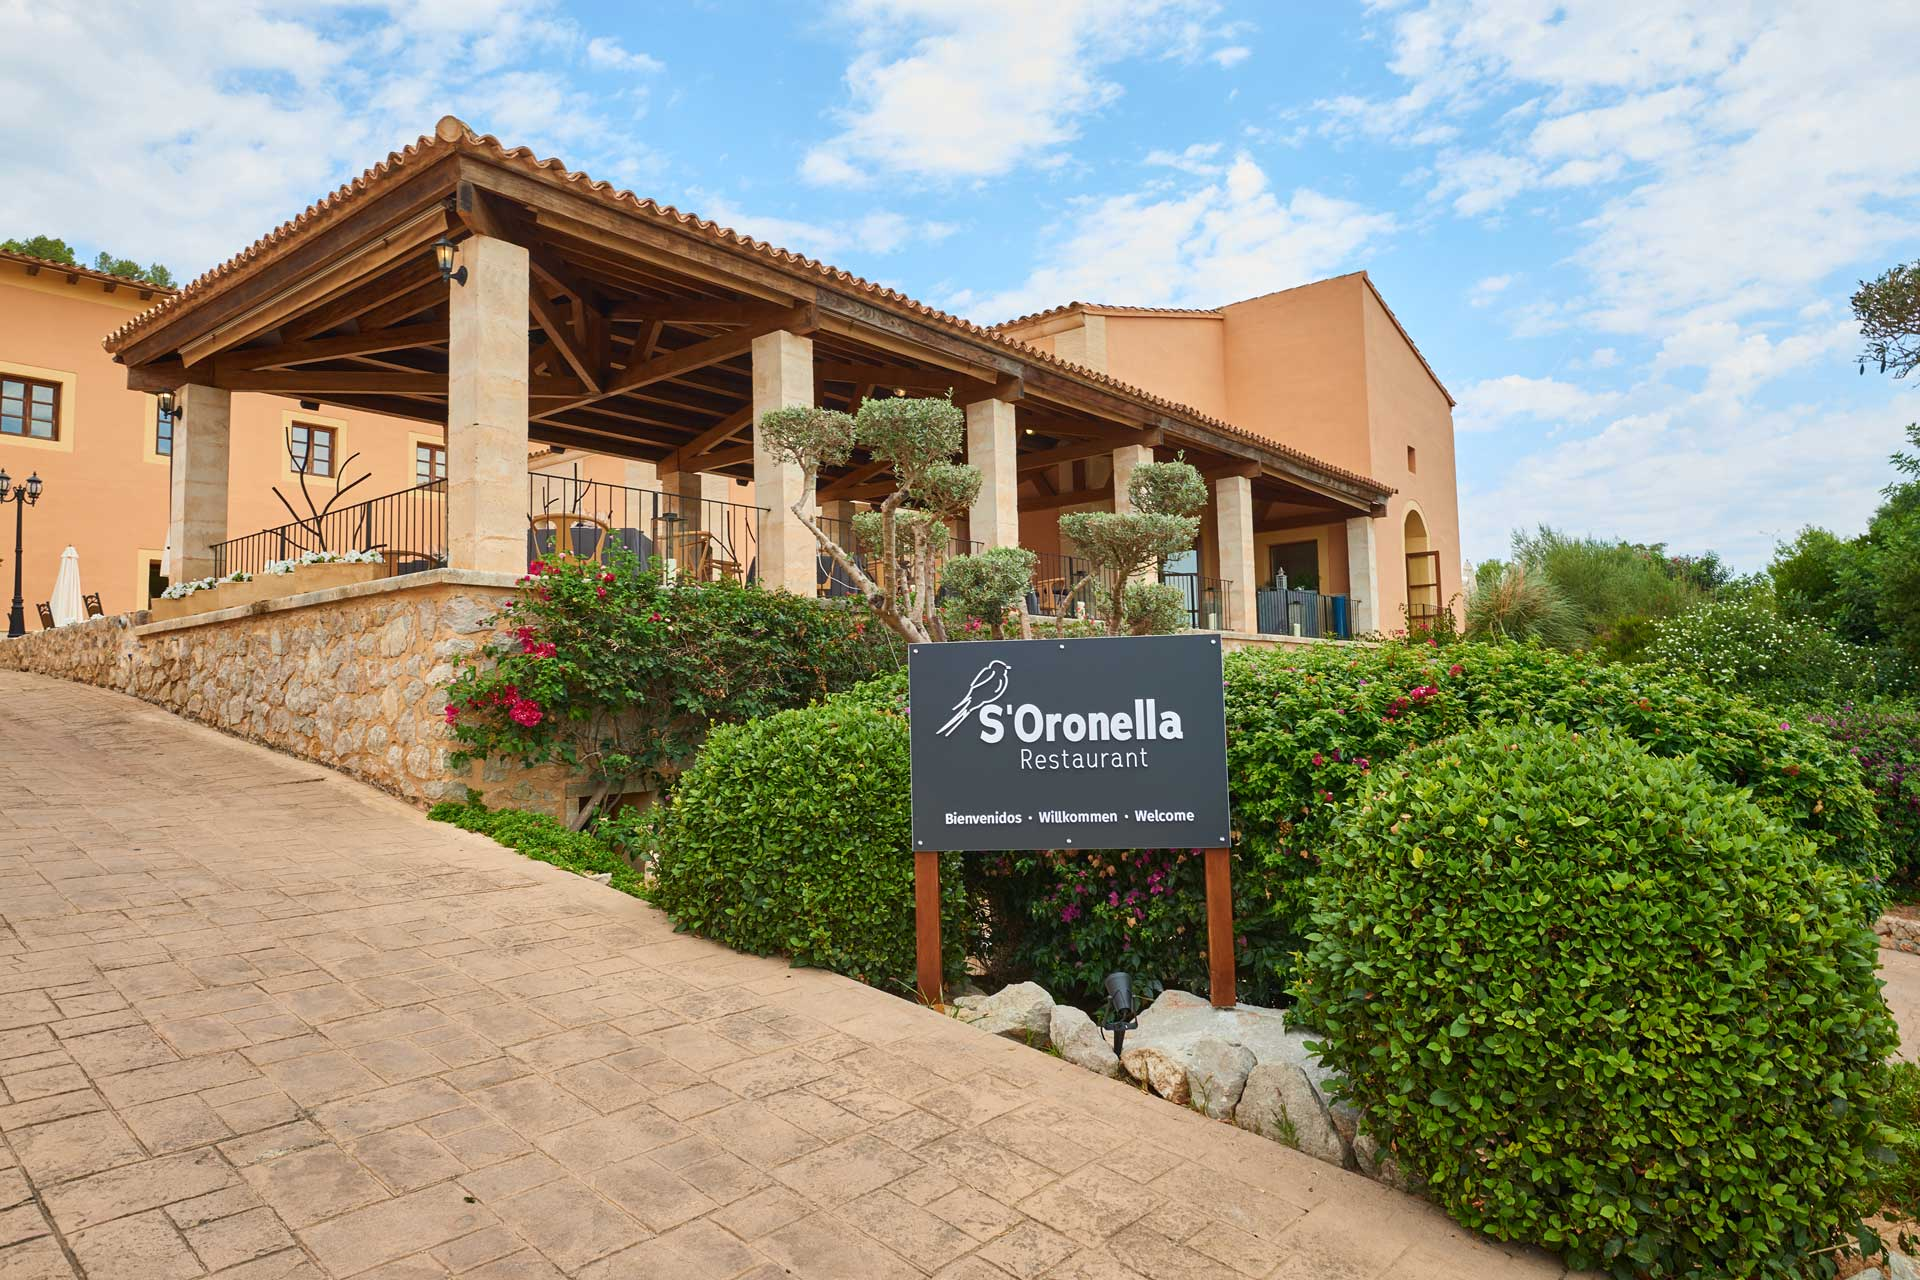 Finca-Hotel Sentido Pula Suites - Restaurant S'Oronella